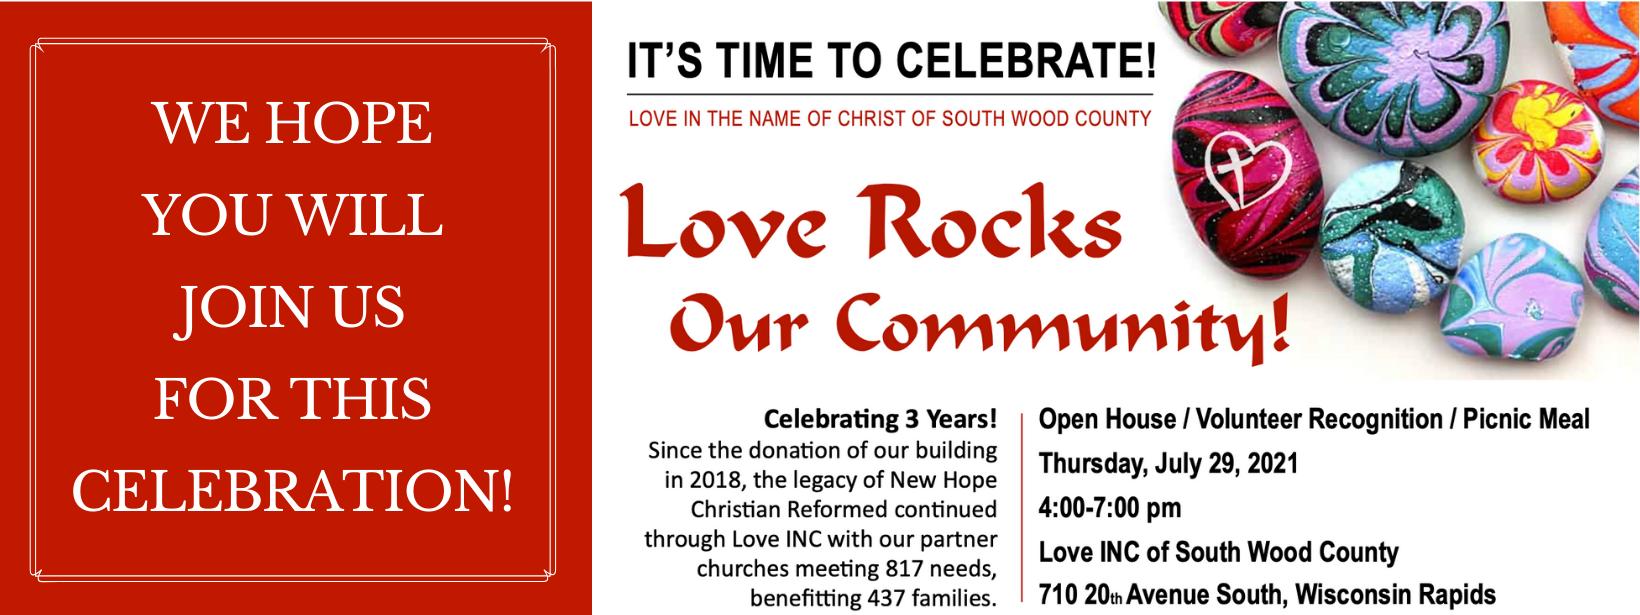 Copy of Love Rocks Banner